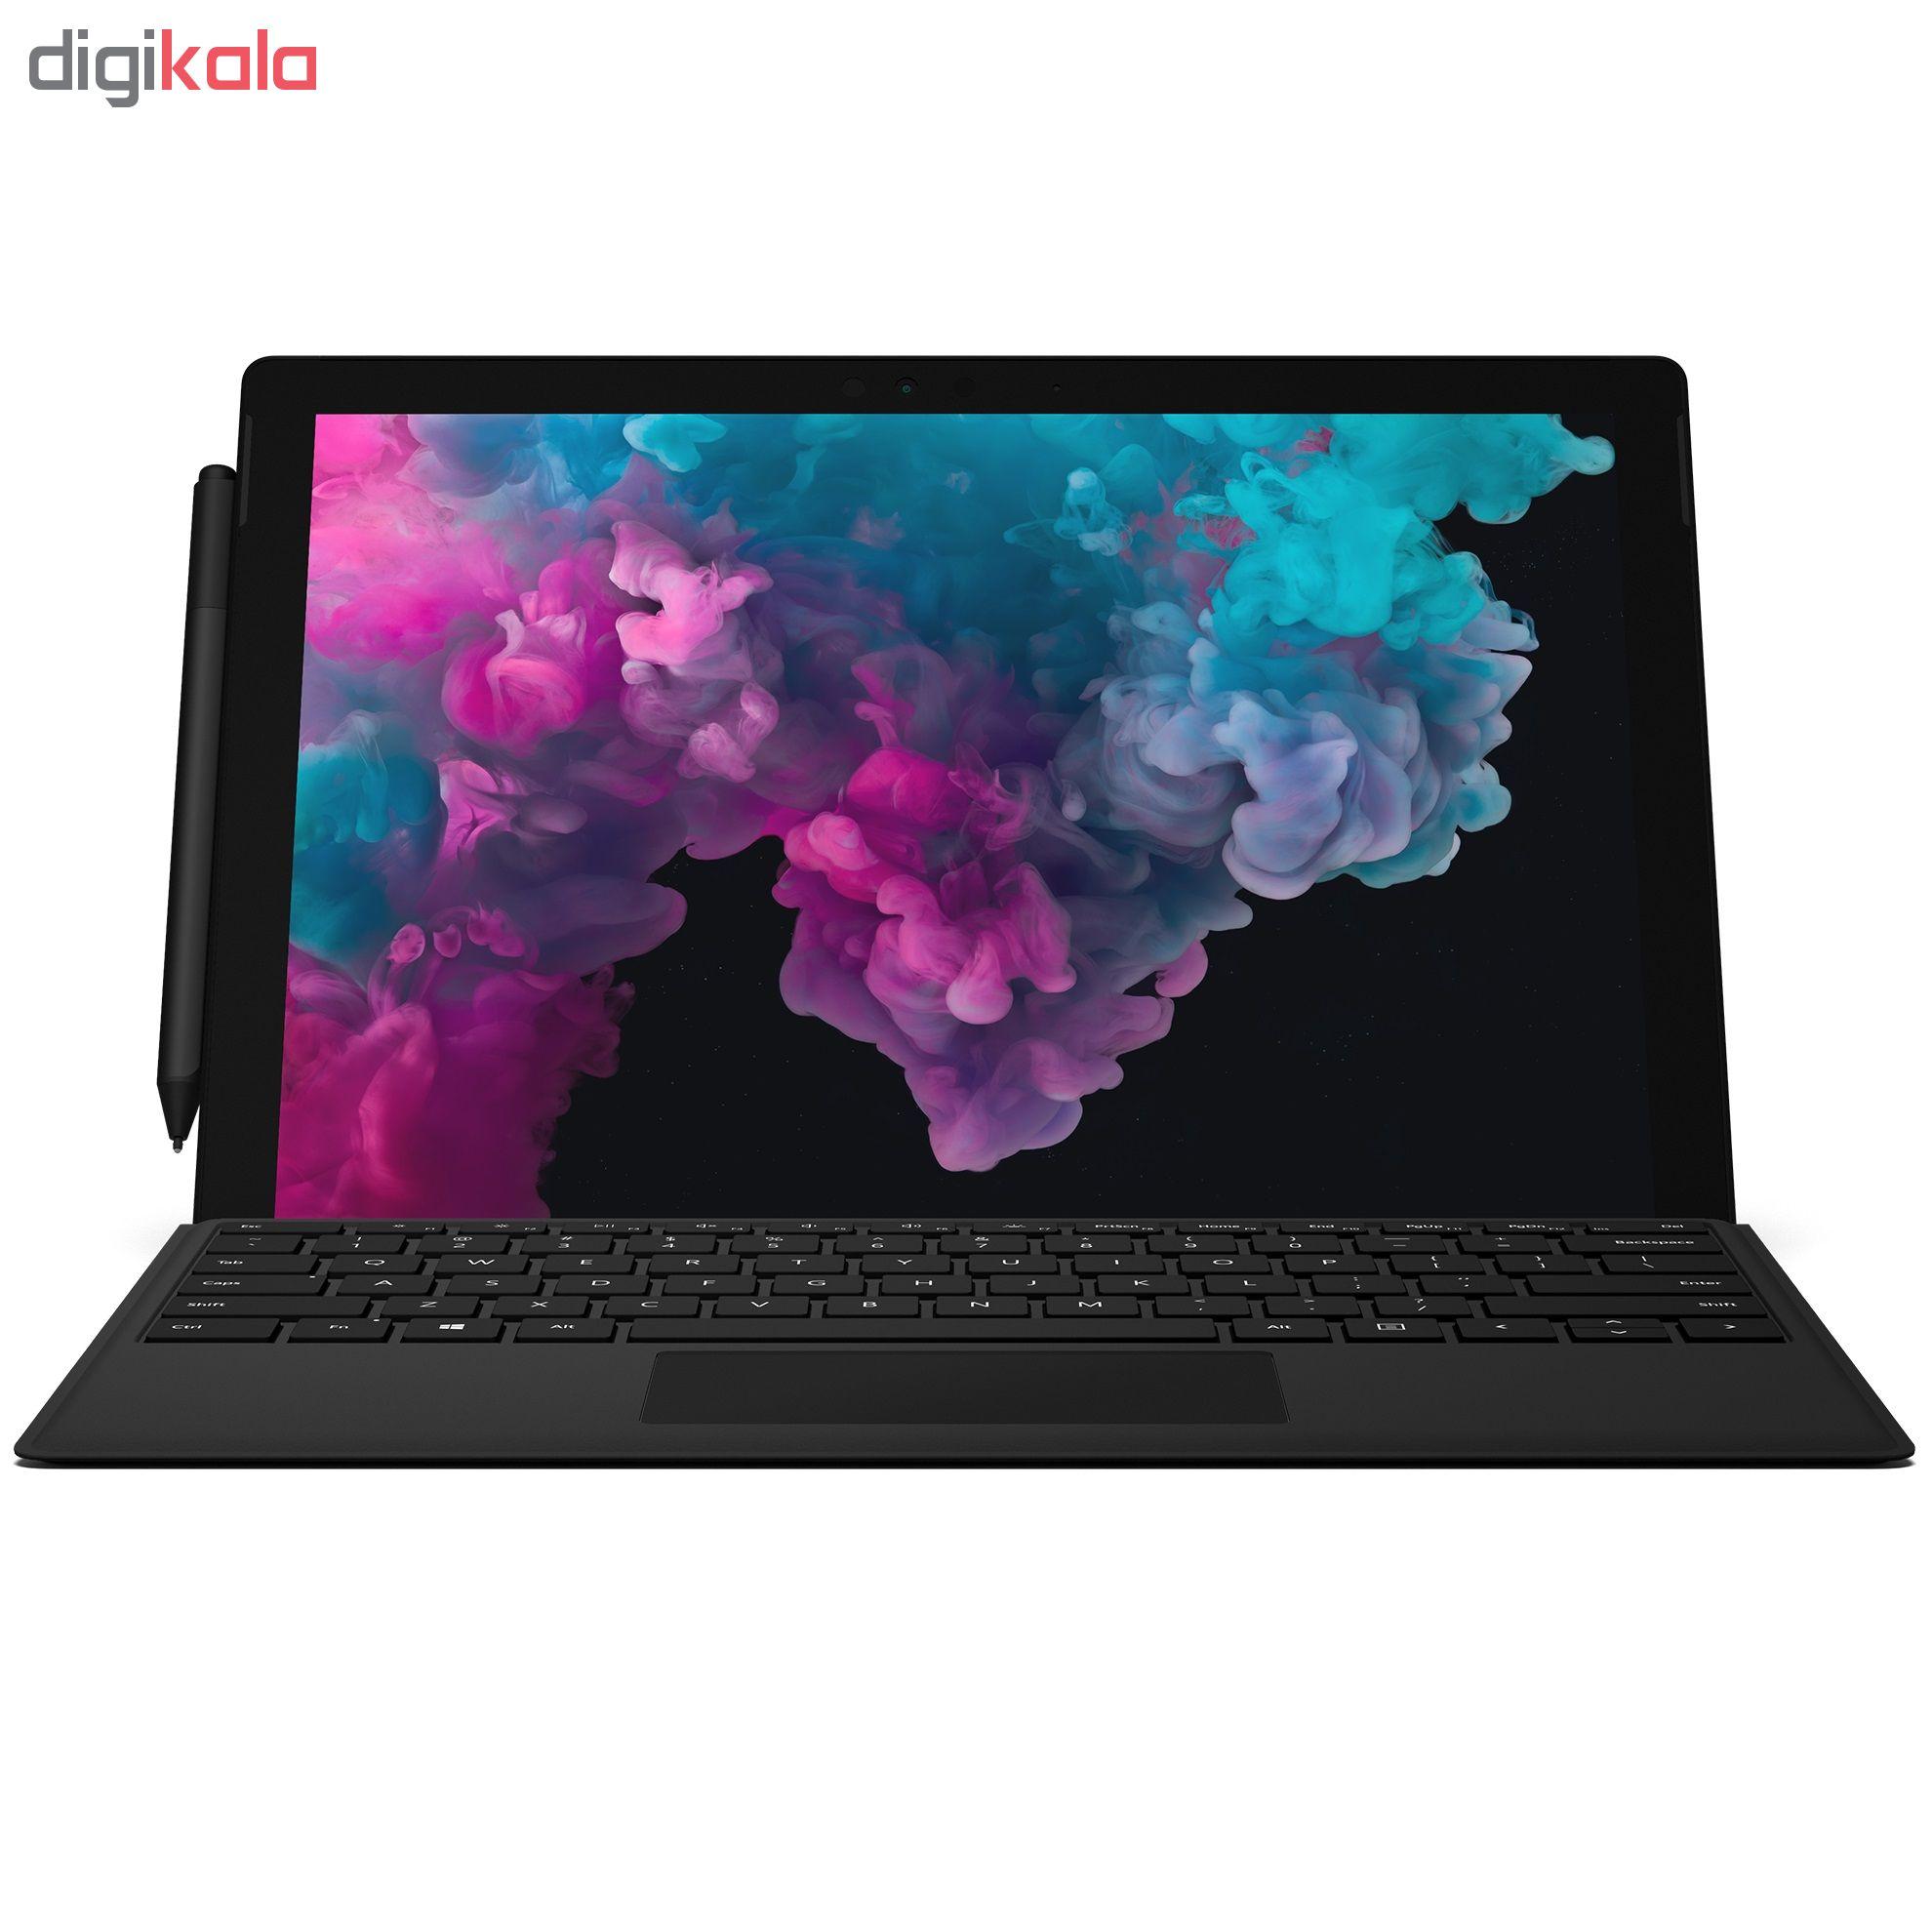 تبلت مایکروسافت مدل Surface Pro 6 - B به همراه کیبورد Black Type Cover  و قلم main 1 4